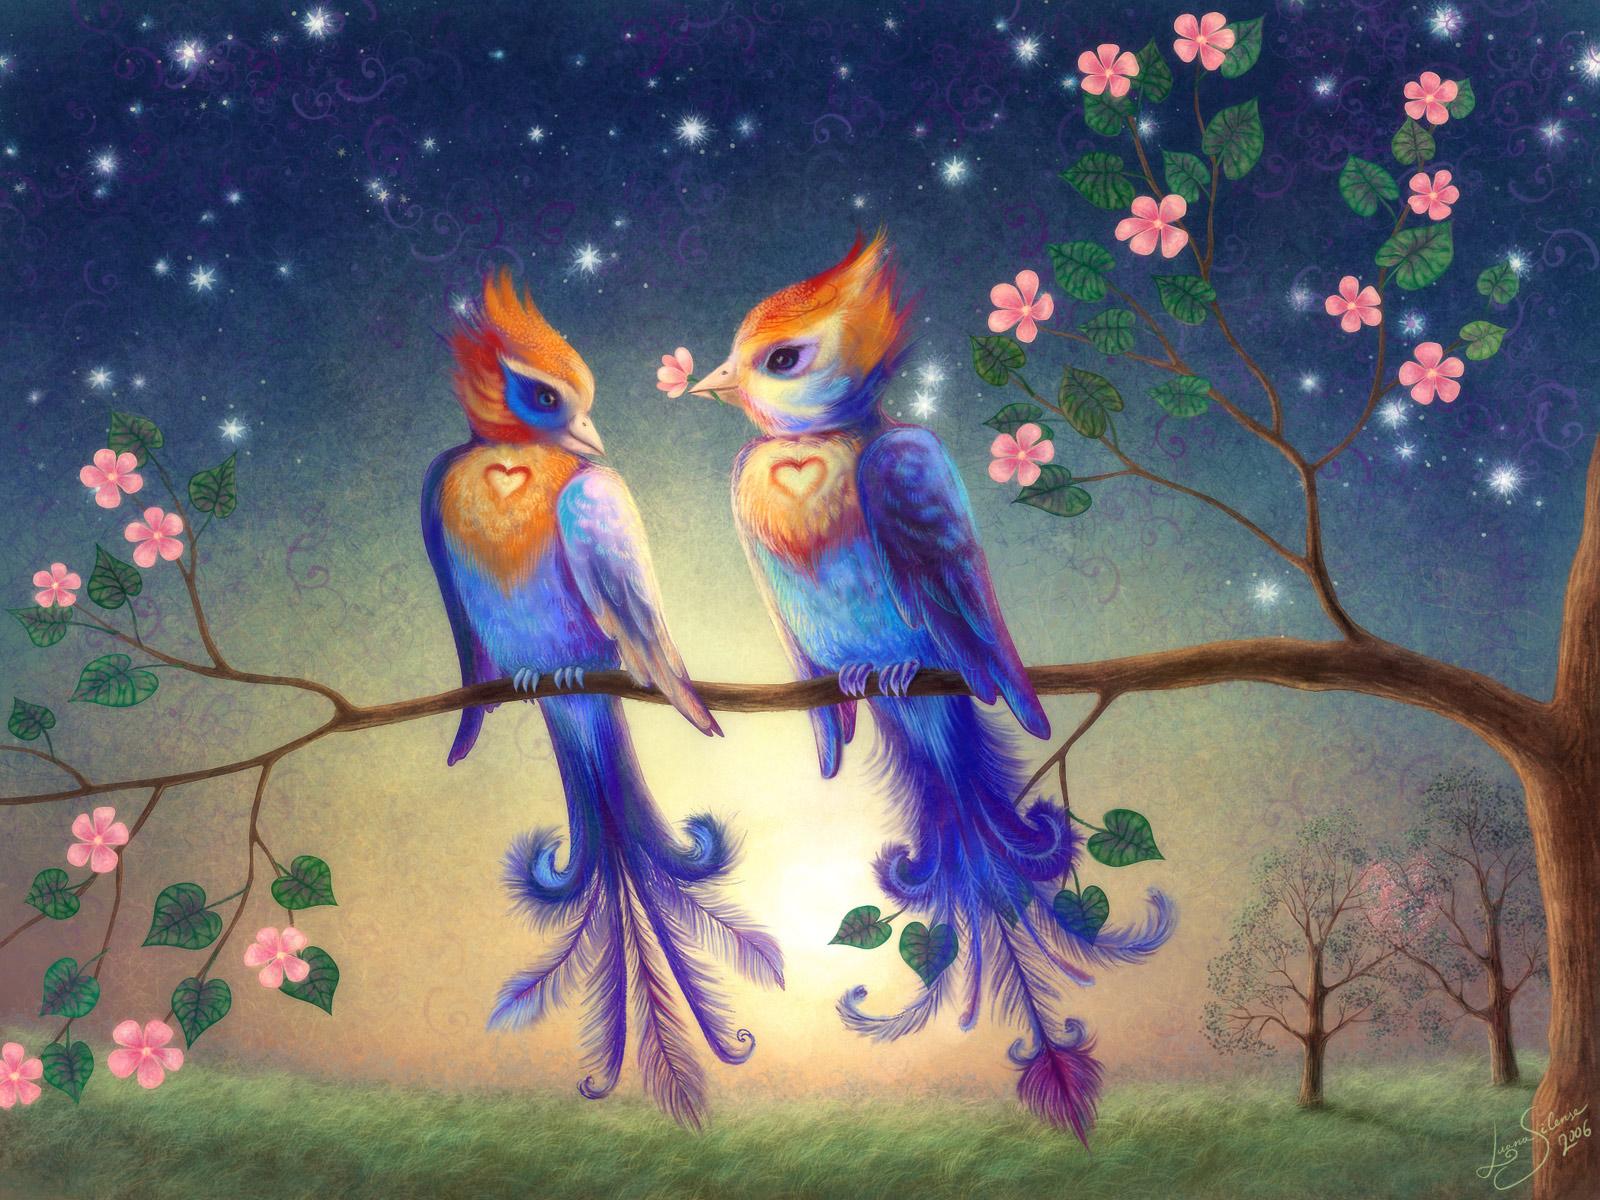 Birds Wallpapers Hd Birds Wallpapers Widescreen